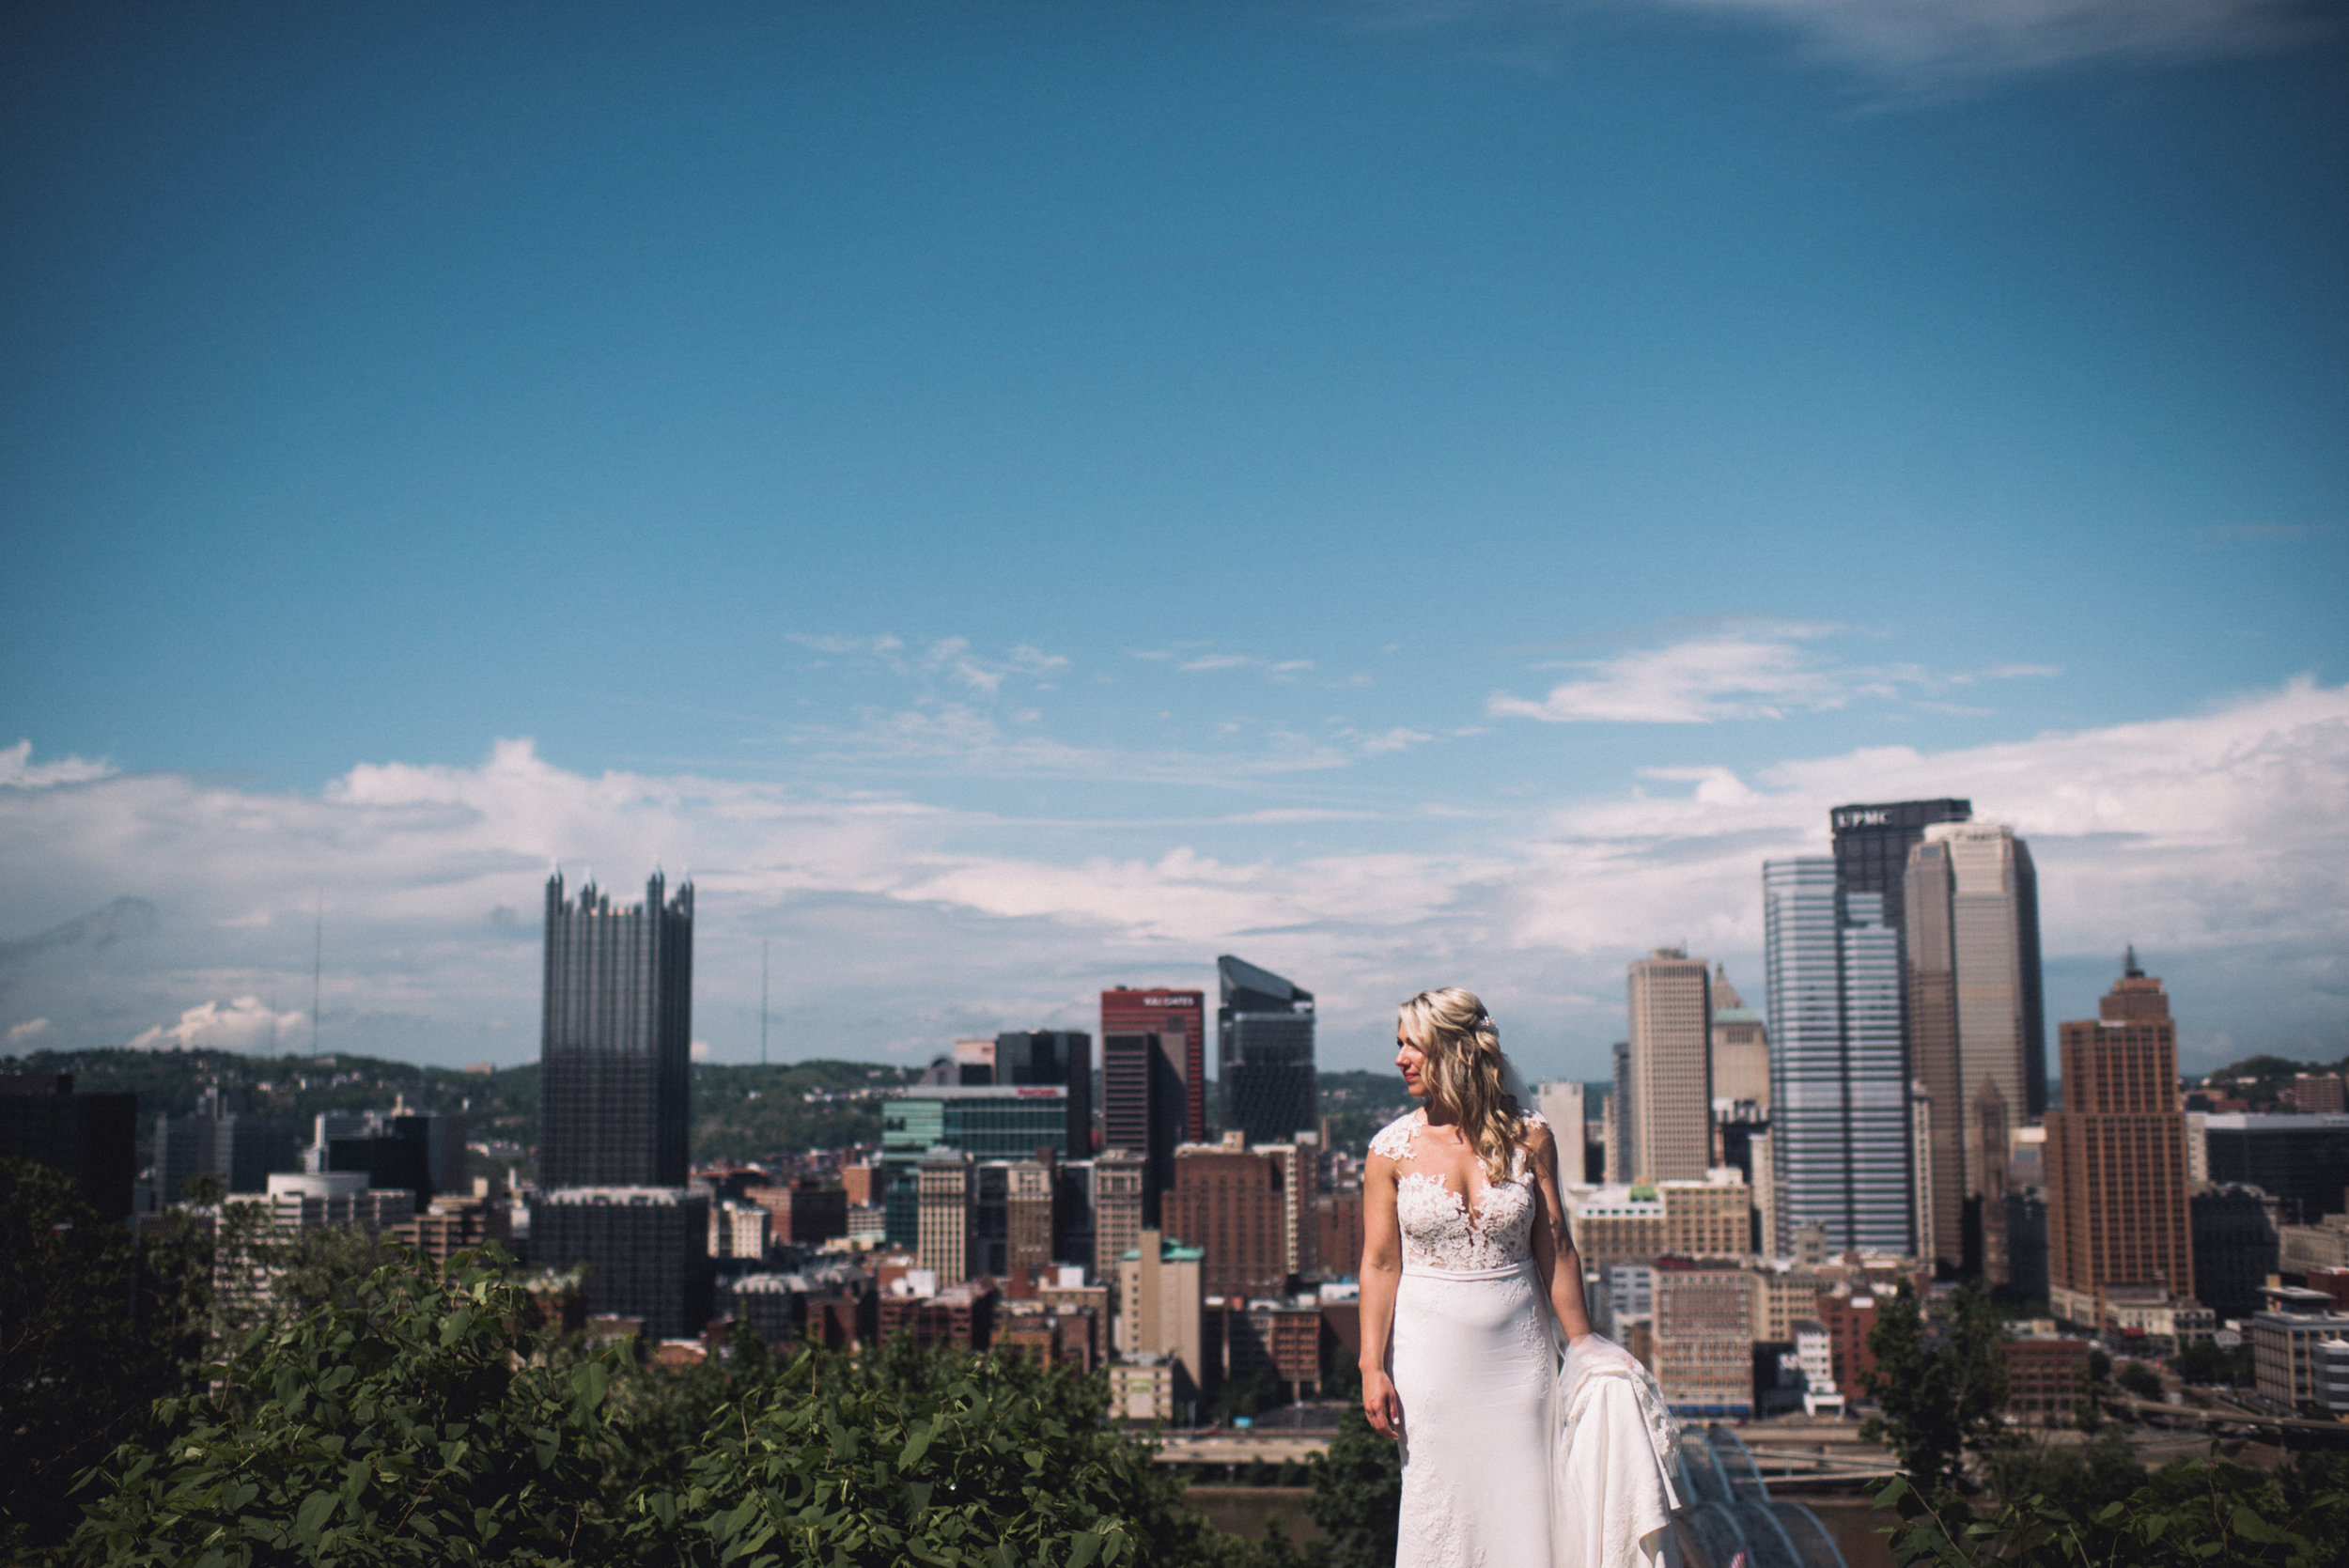 Pittsburgh Pennsylvania New York NYC Wedding Photographer Photojournalist Luxury Downtown Opera - Stirpe 984.jpg